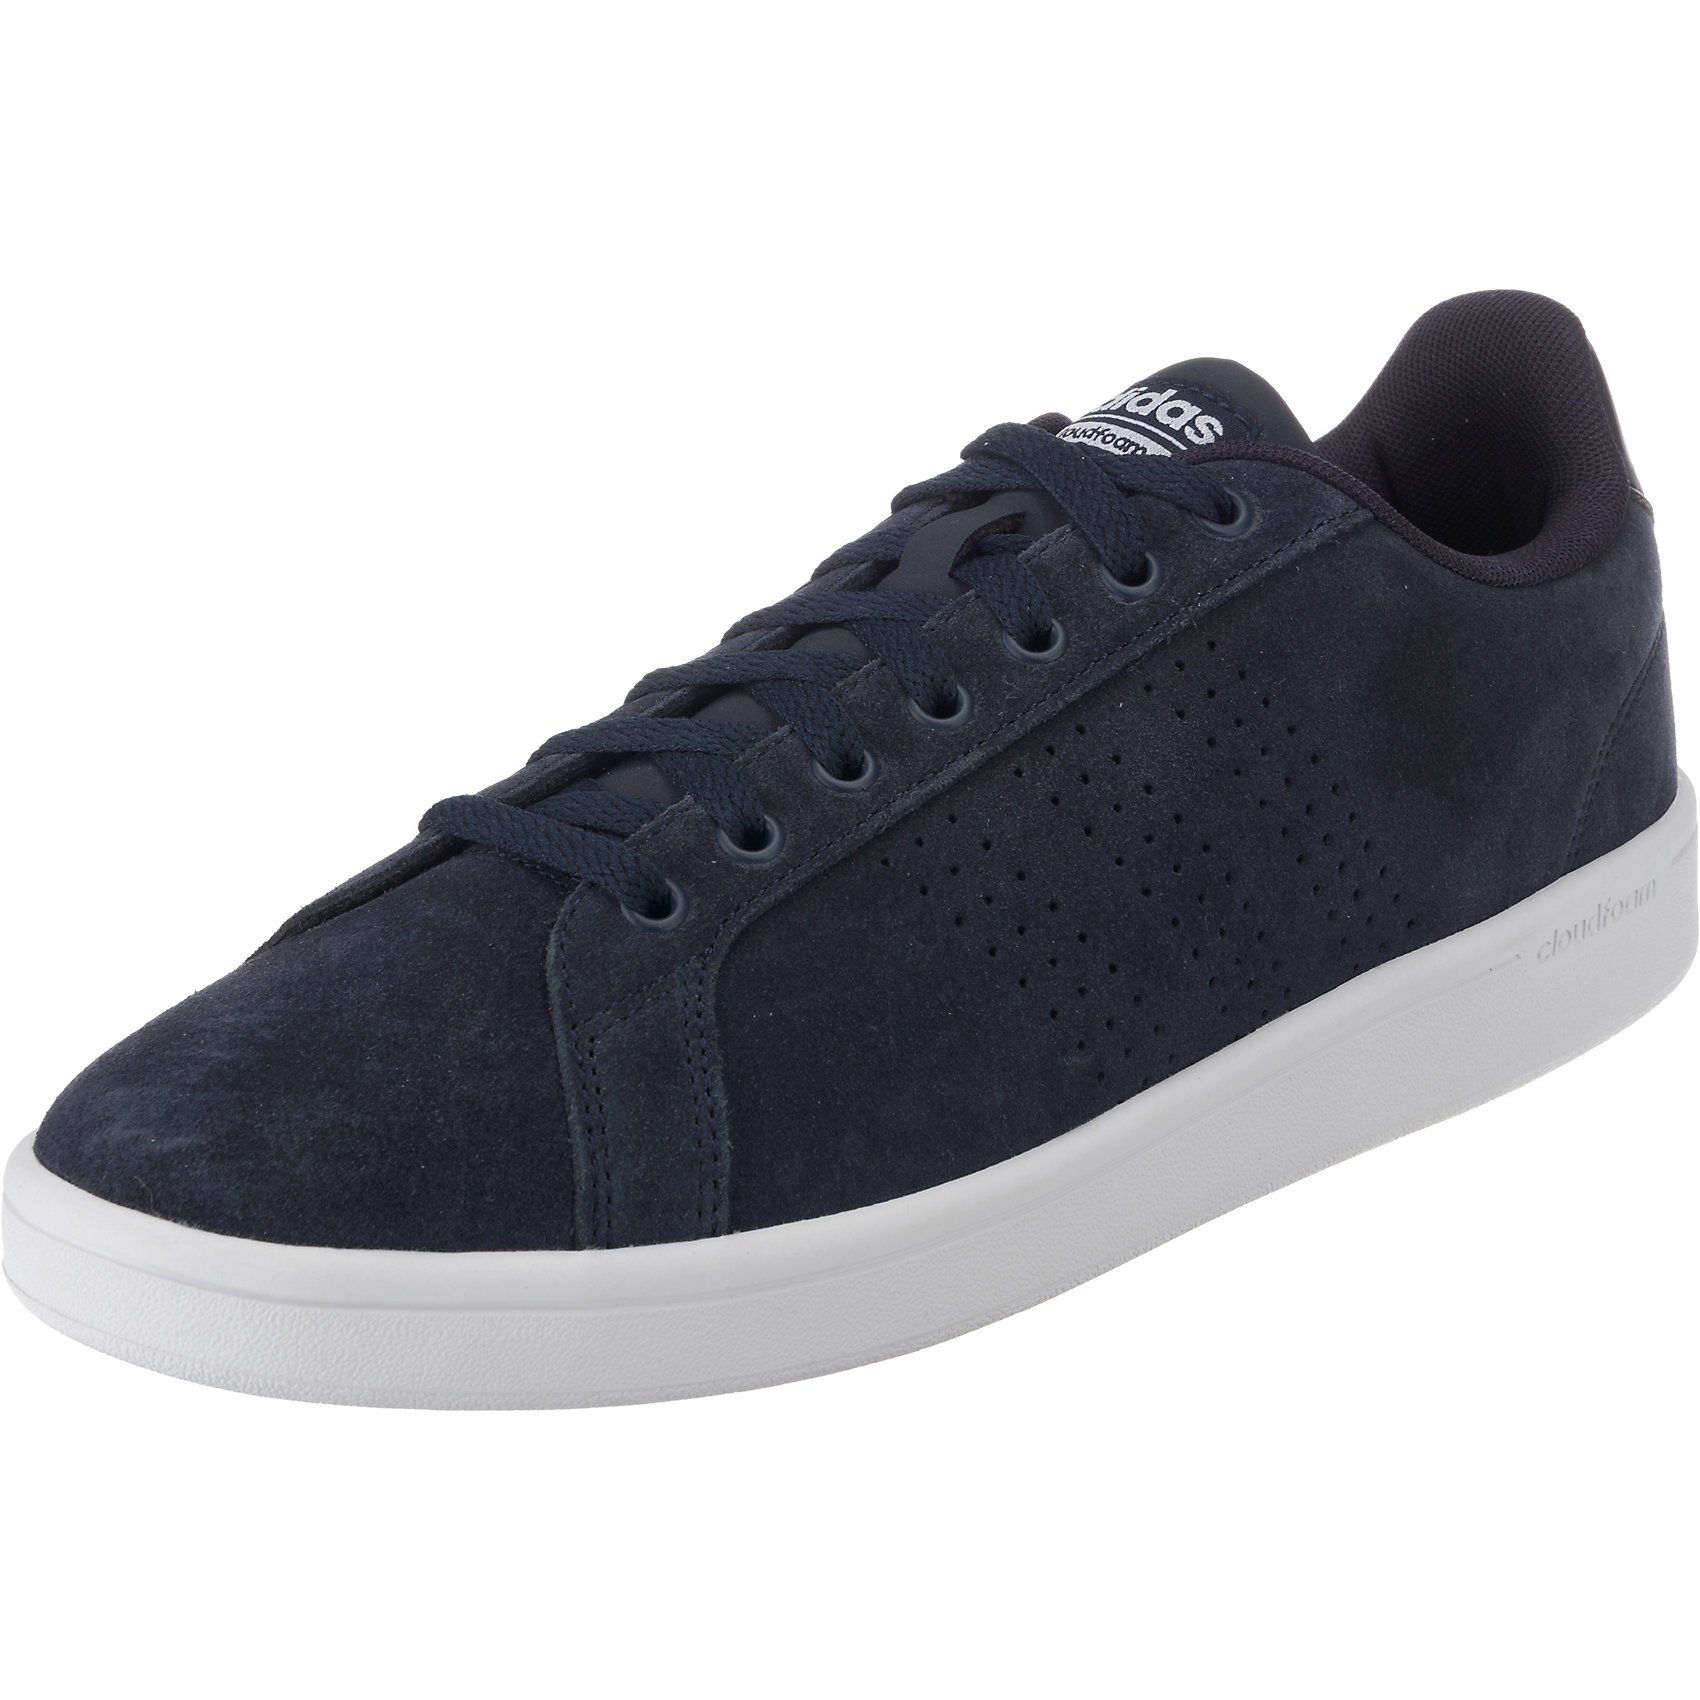 ... Neu Niedrig adidas Sport InspiROT Cf AdvantageCl Sneakers Niedrig Neu  8338472 für Herren a9ac36 ... 25fb9e40b4d4